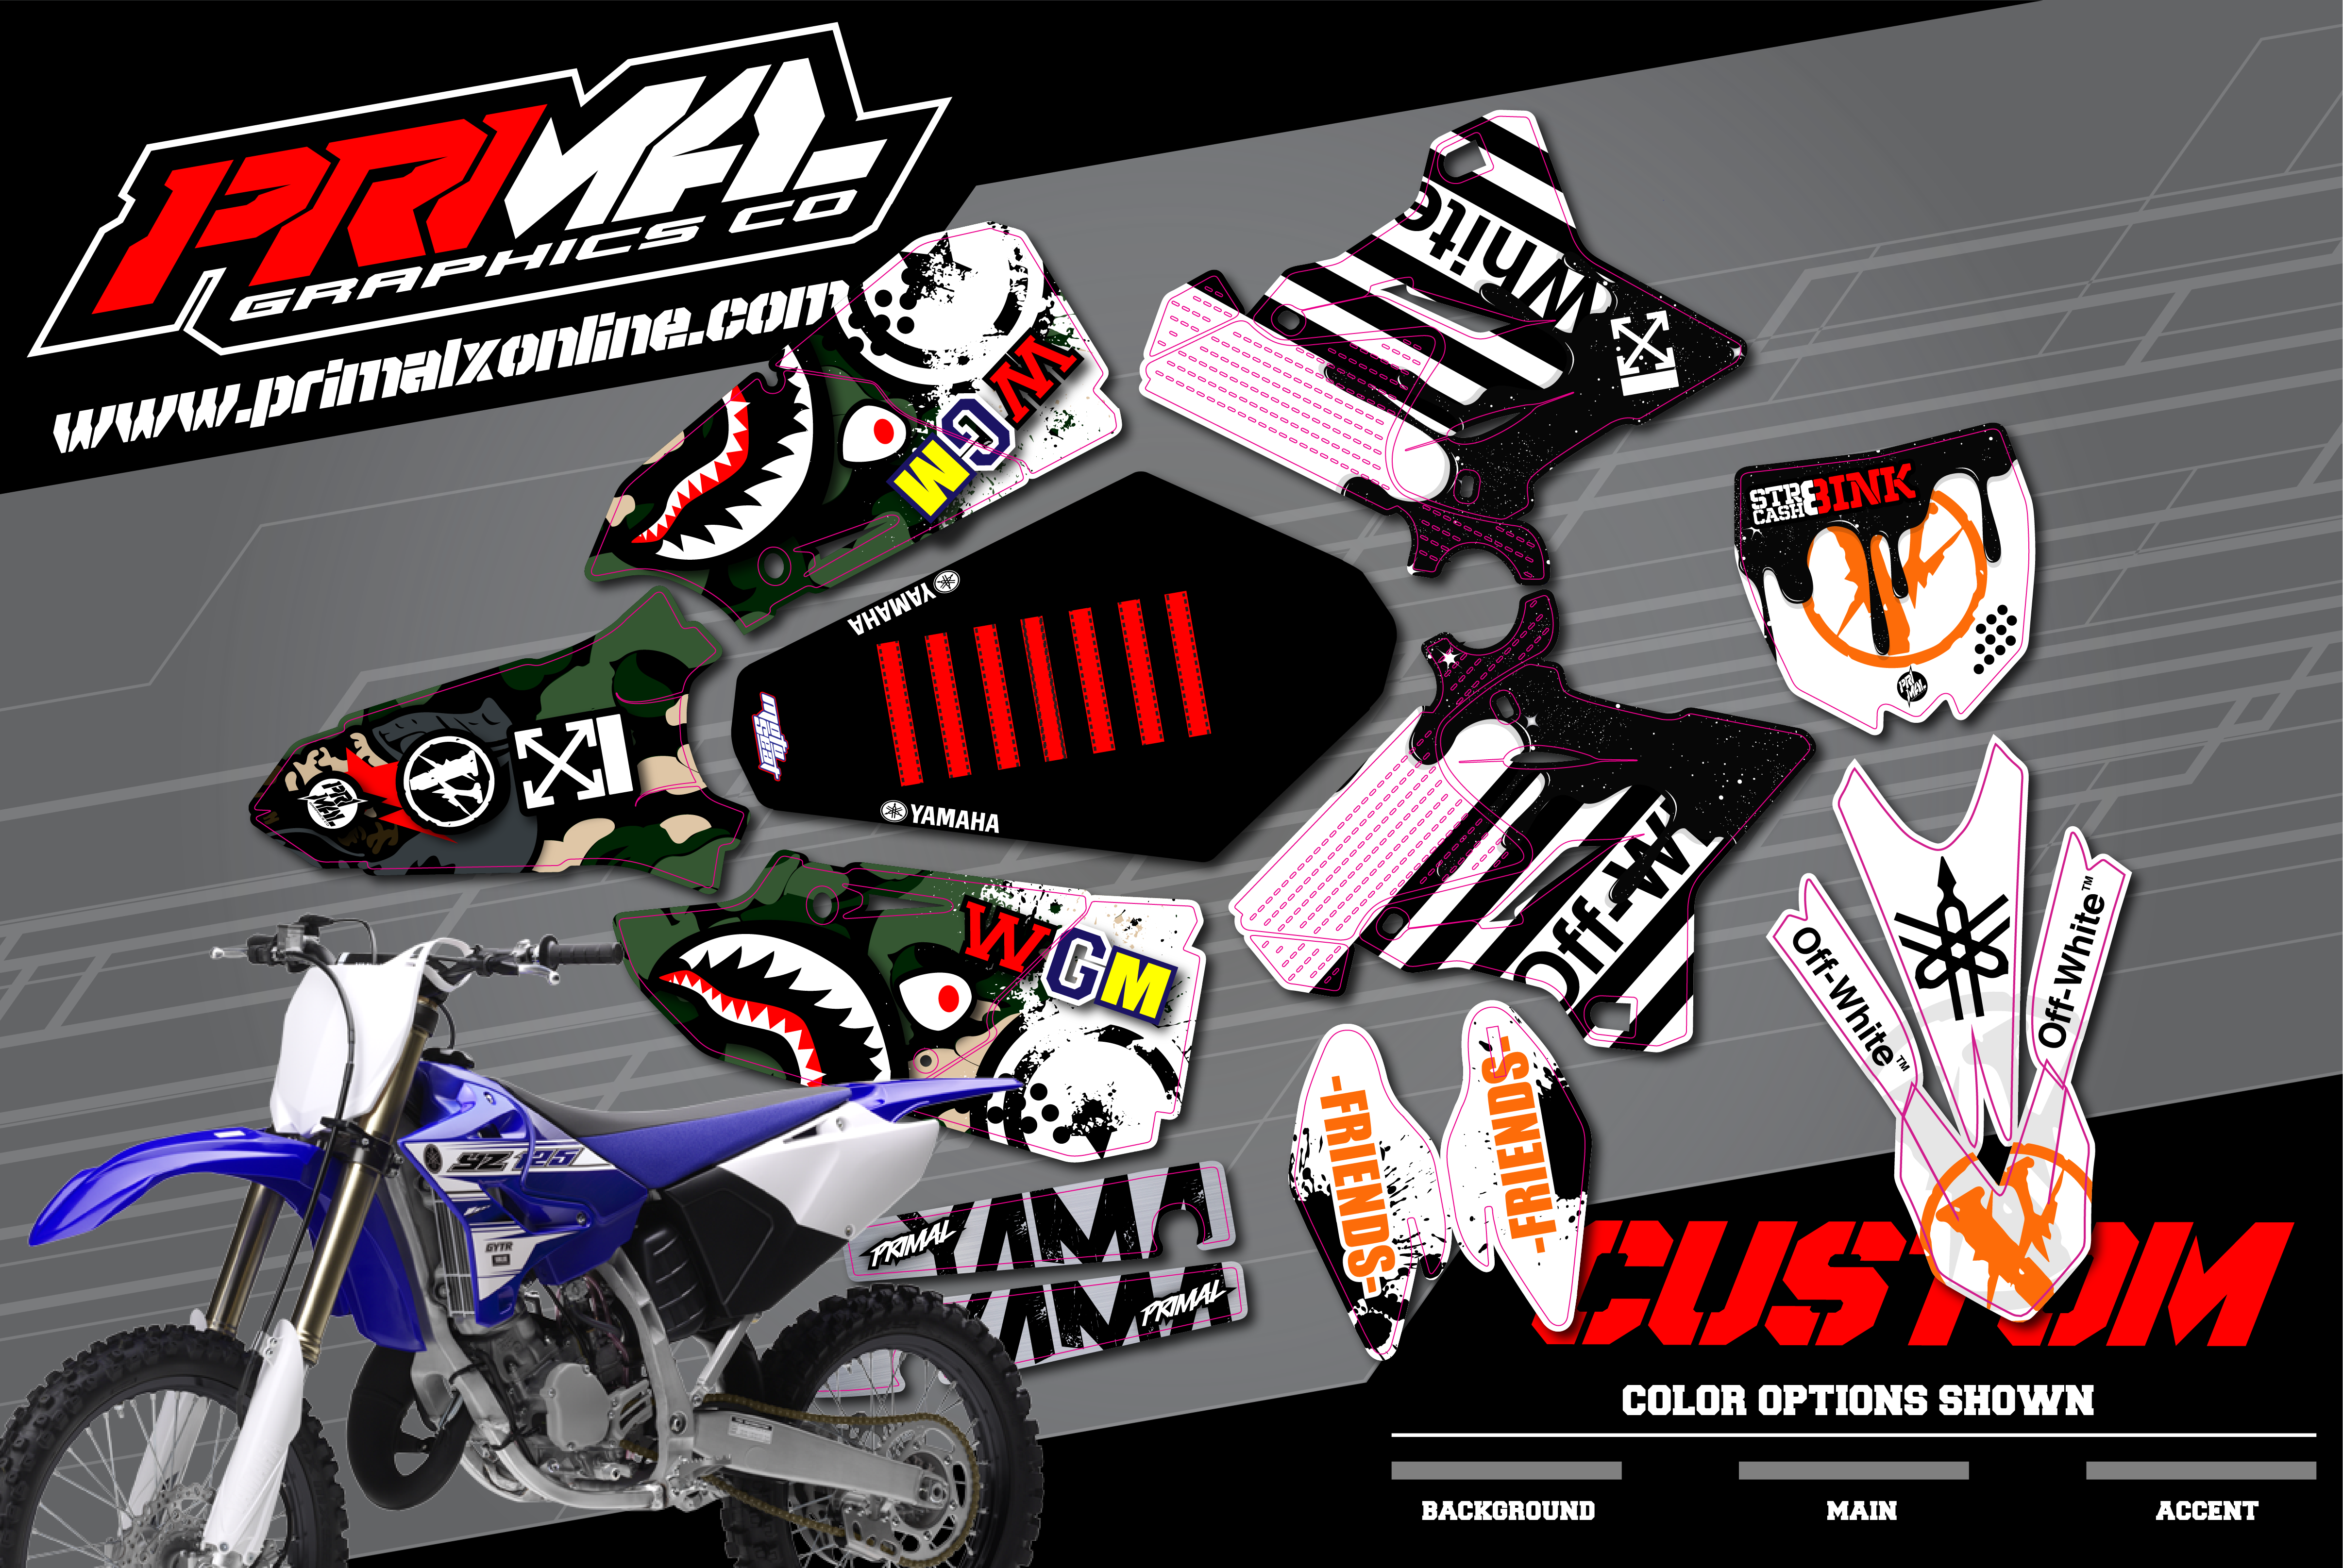 PRIMAL-X-MOTORSPORTS-PRIMAL-GRAPHICS-CO-SUZUKI-DRZ400SM-SUPERMOTO-MOTOCROSS-GRAPHICS-BIKELIFE-CHARMCITY-VLONE-OFFWHITE-APE-01